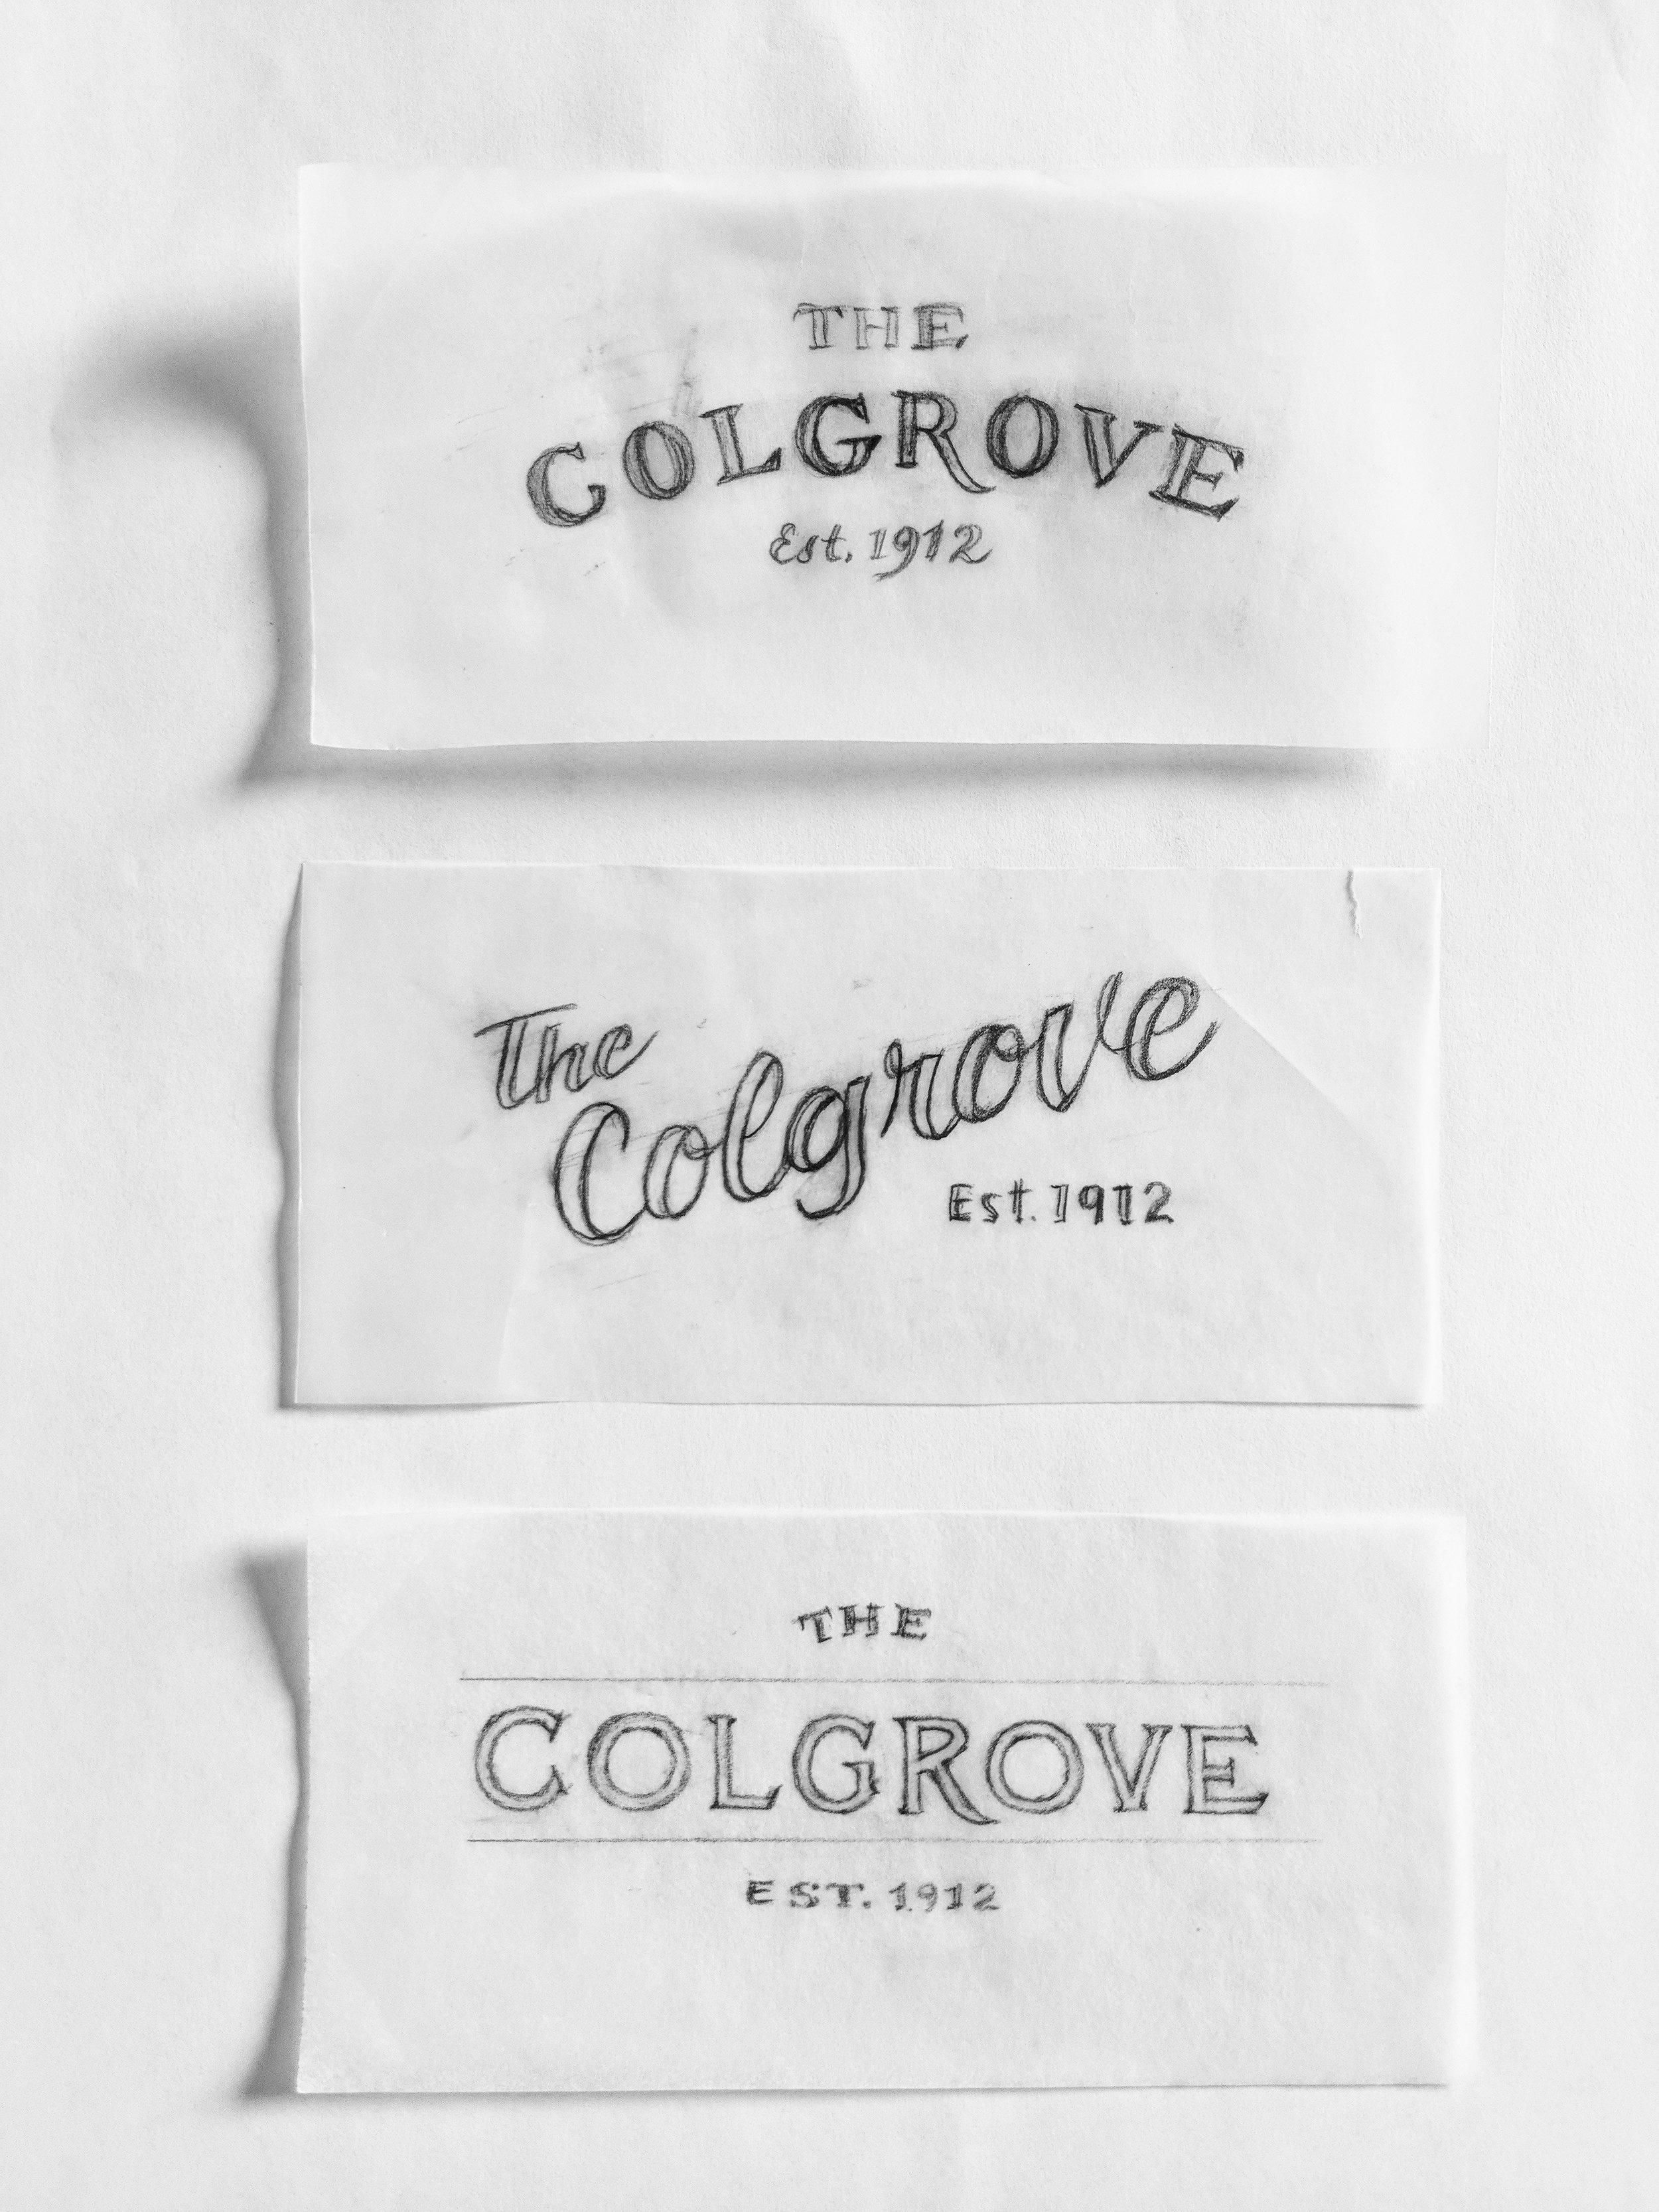 colgrove_IMG_20180920_141901.jpg